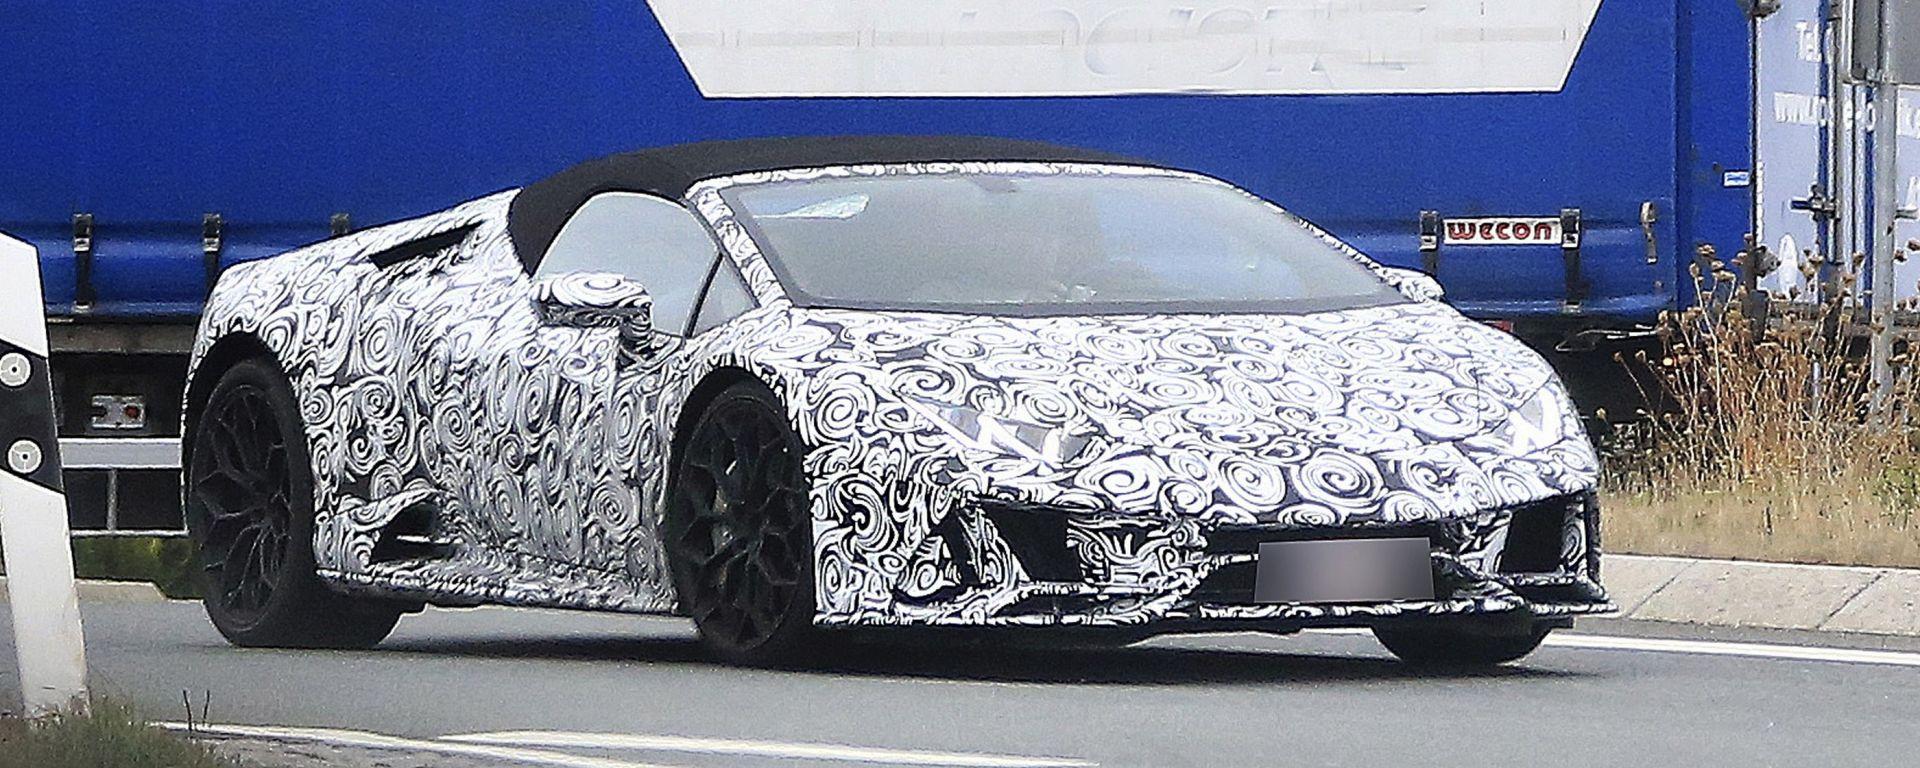 Lamborghini Huracàn Spyder: le prime foto spia del facelift